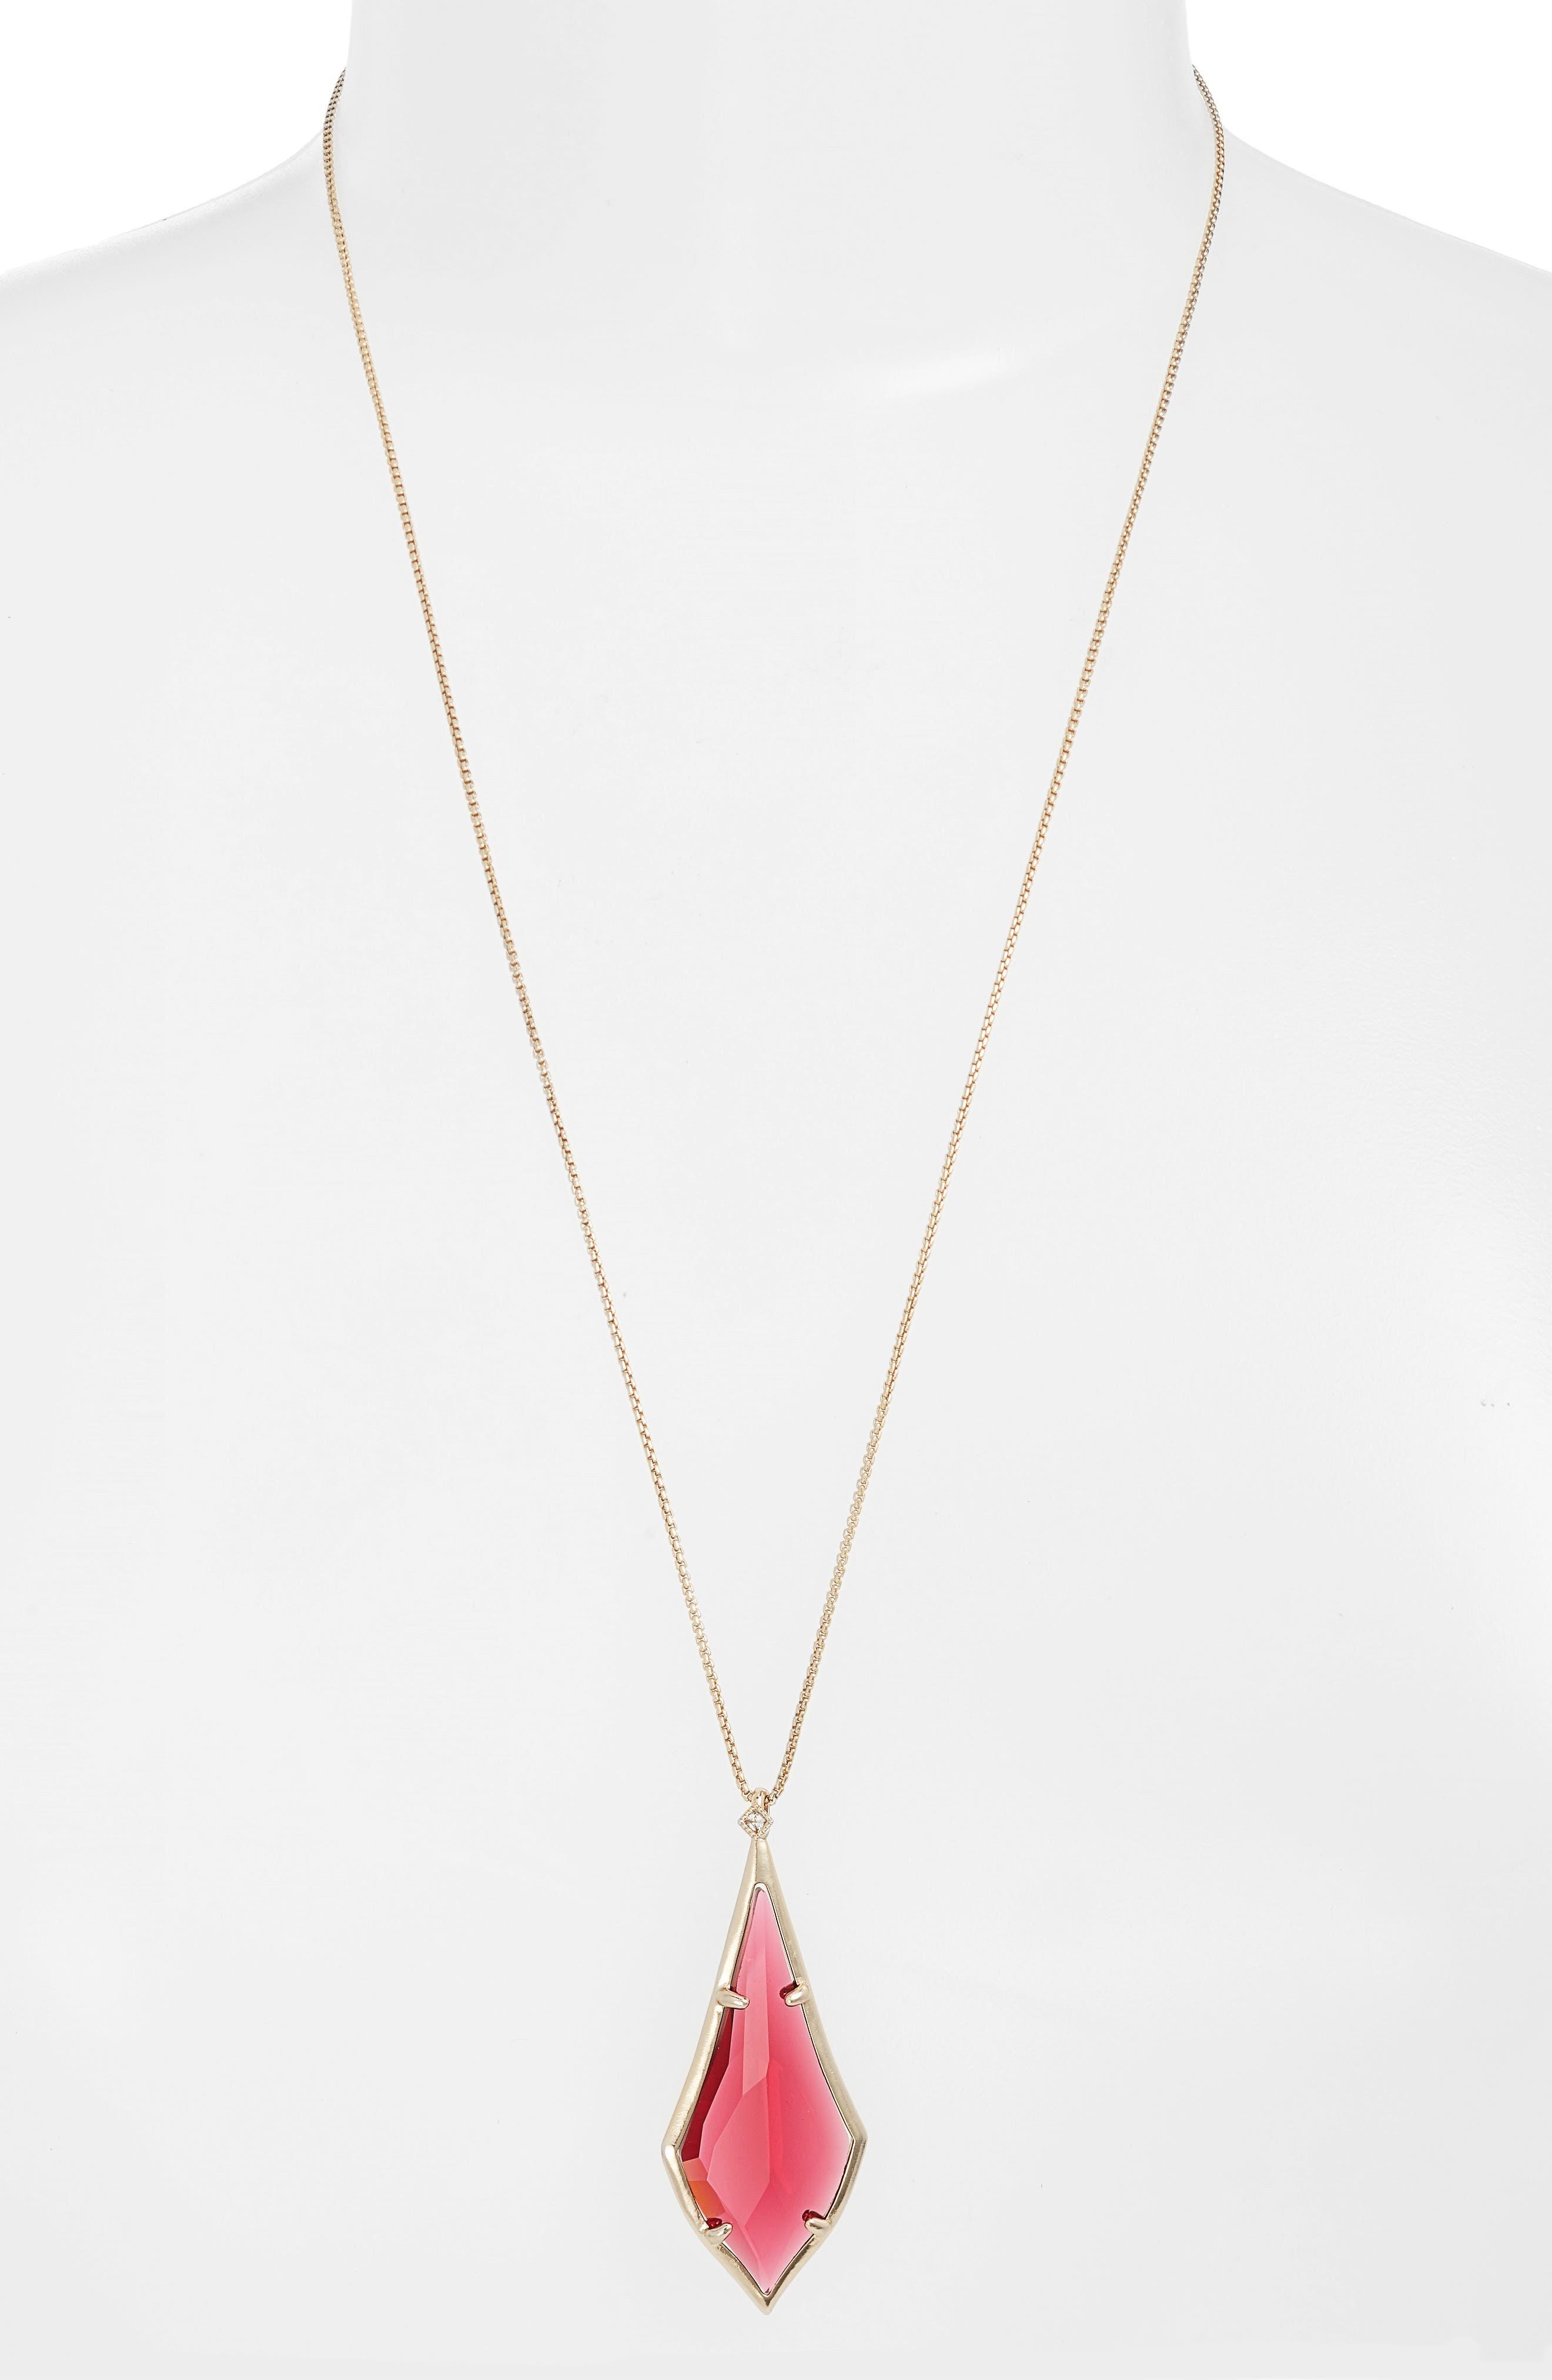 Main Image - Kendra Scott Damon Pendant Necklace